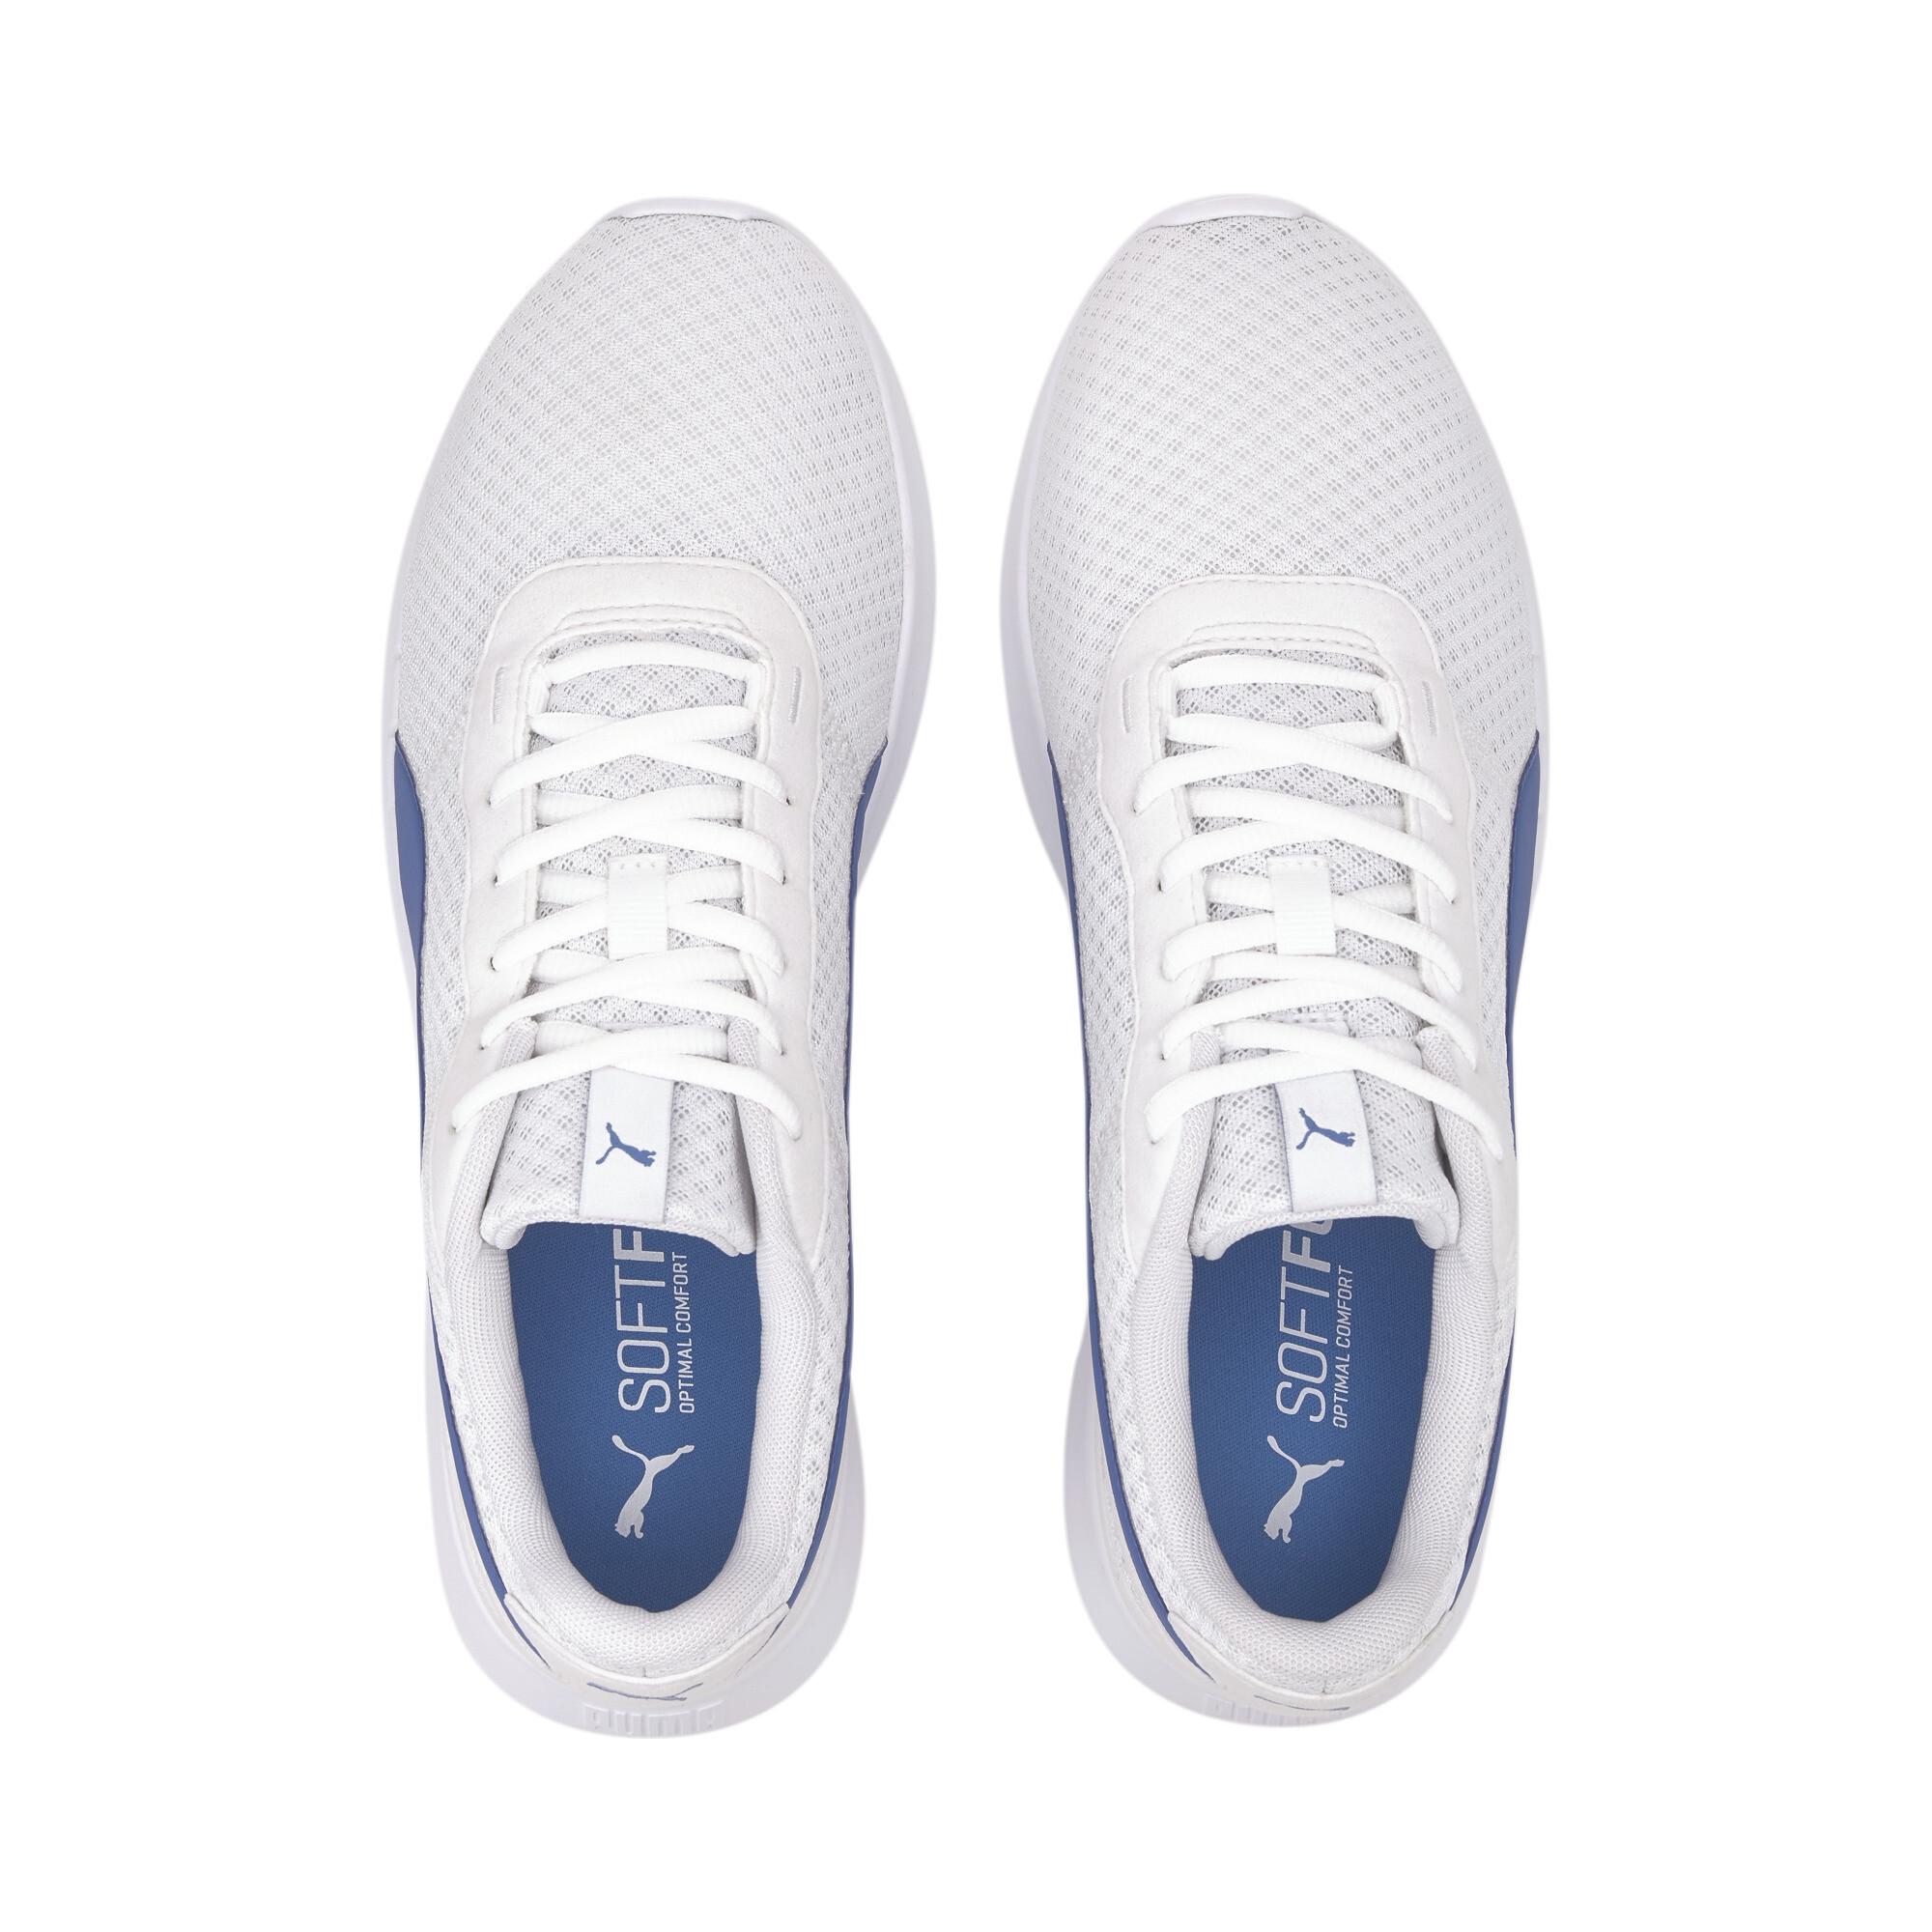 PUMA-Men-039-s-ST-Activate-Sneakers thumbnail 30